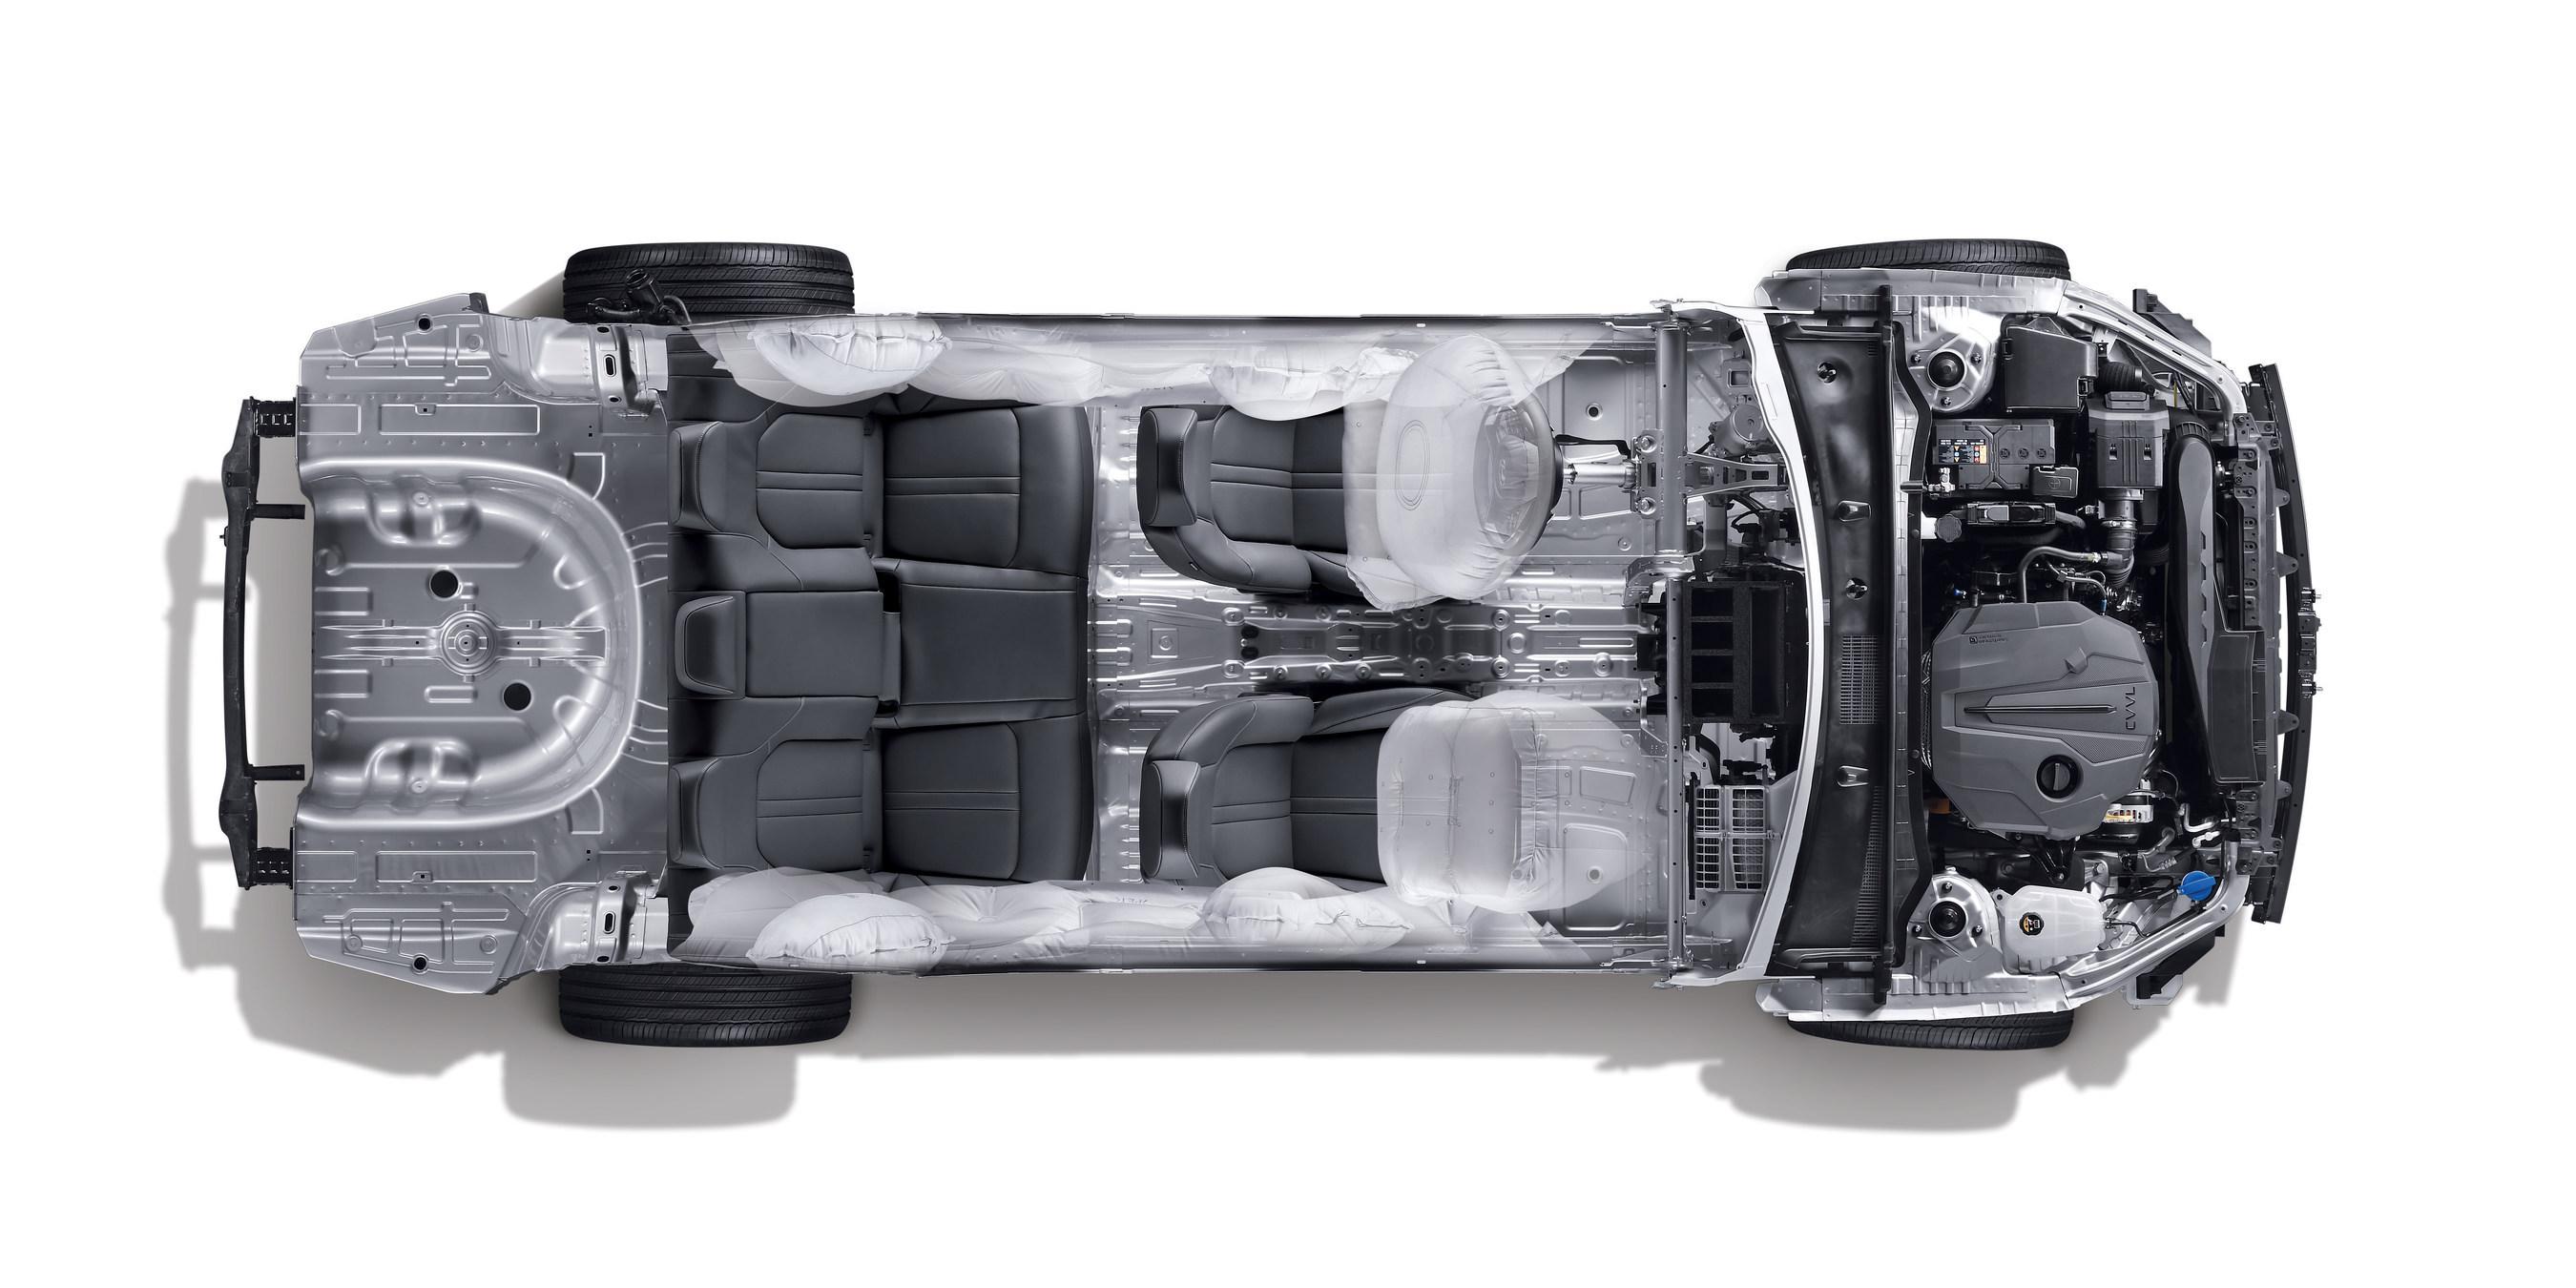 All-New 2020 Sonata Implements Third-Generation Vehicle Platform